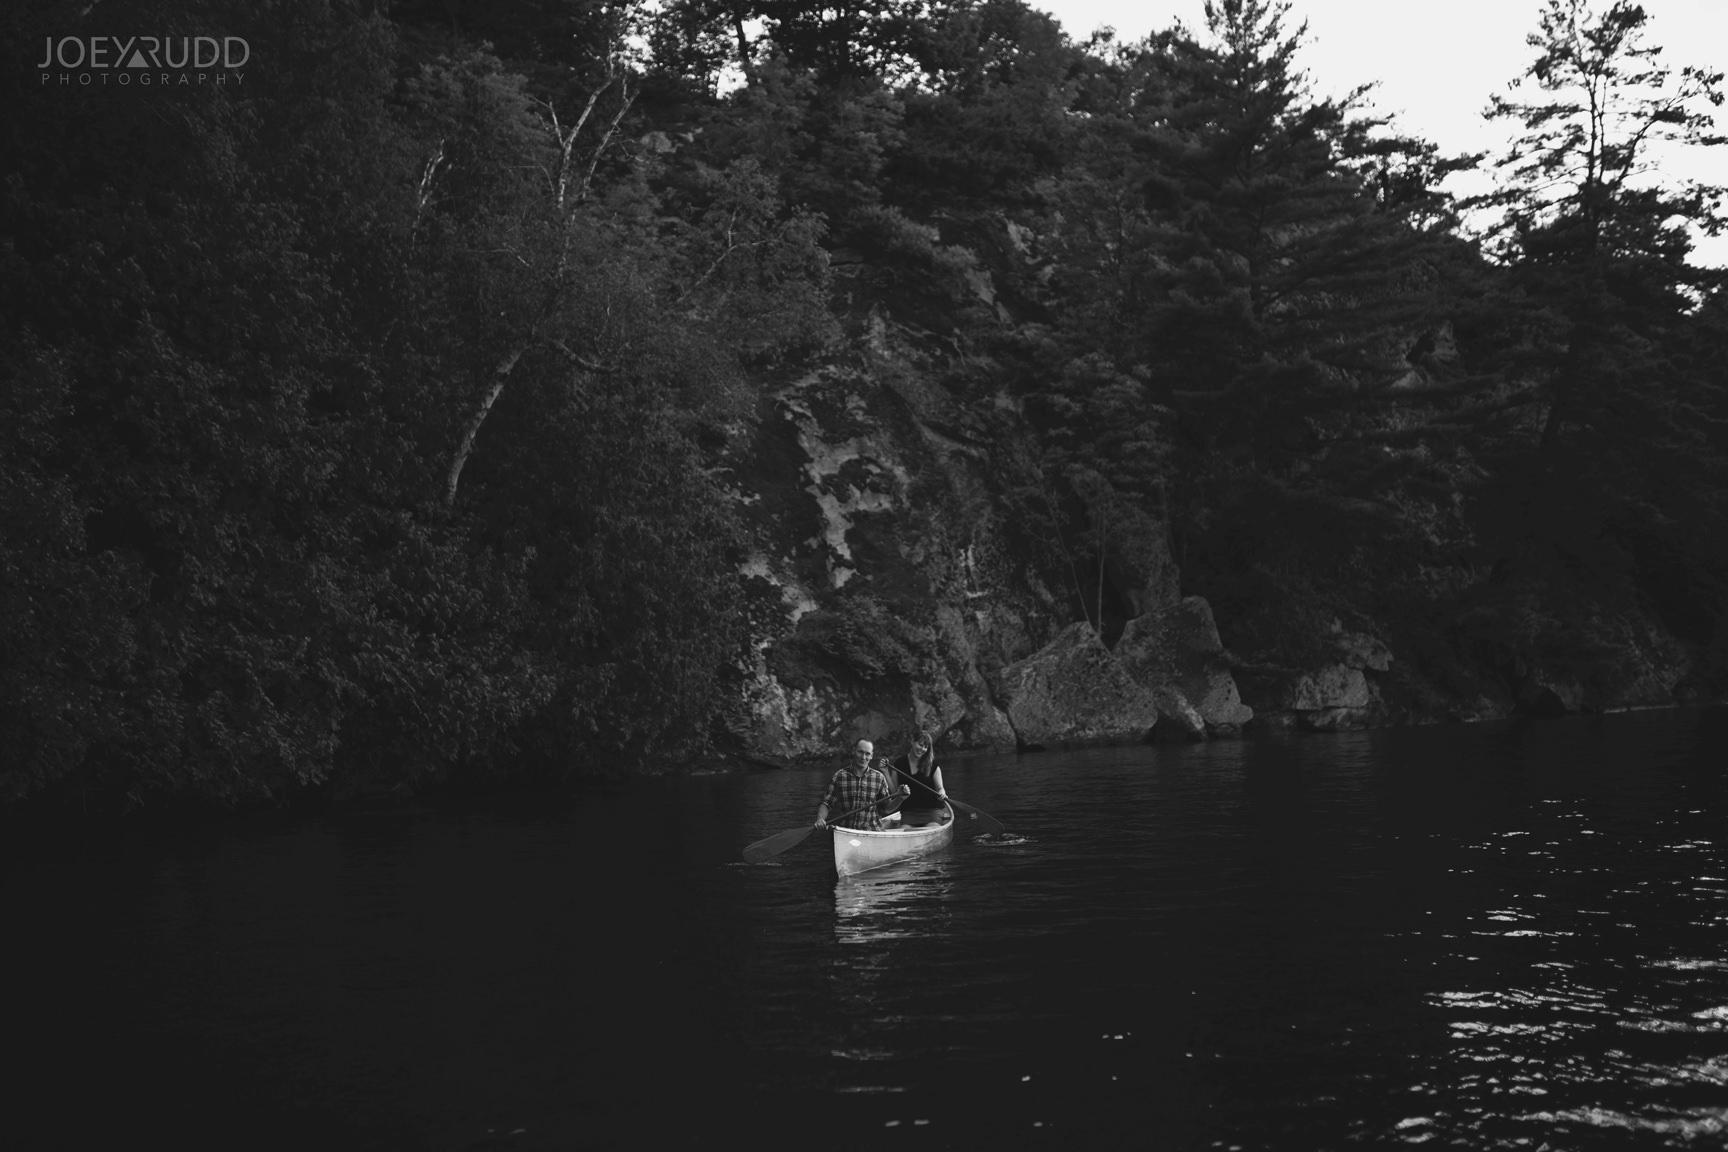 Cottage Engagement Session by Ottawa Wedding Photographer Joey Rudd Photography Canoeing